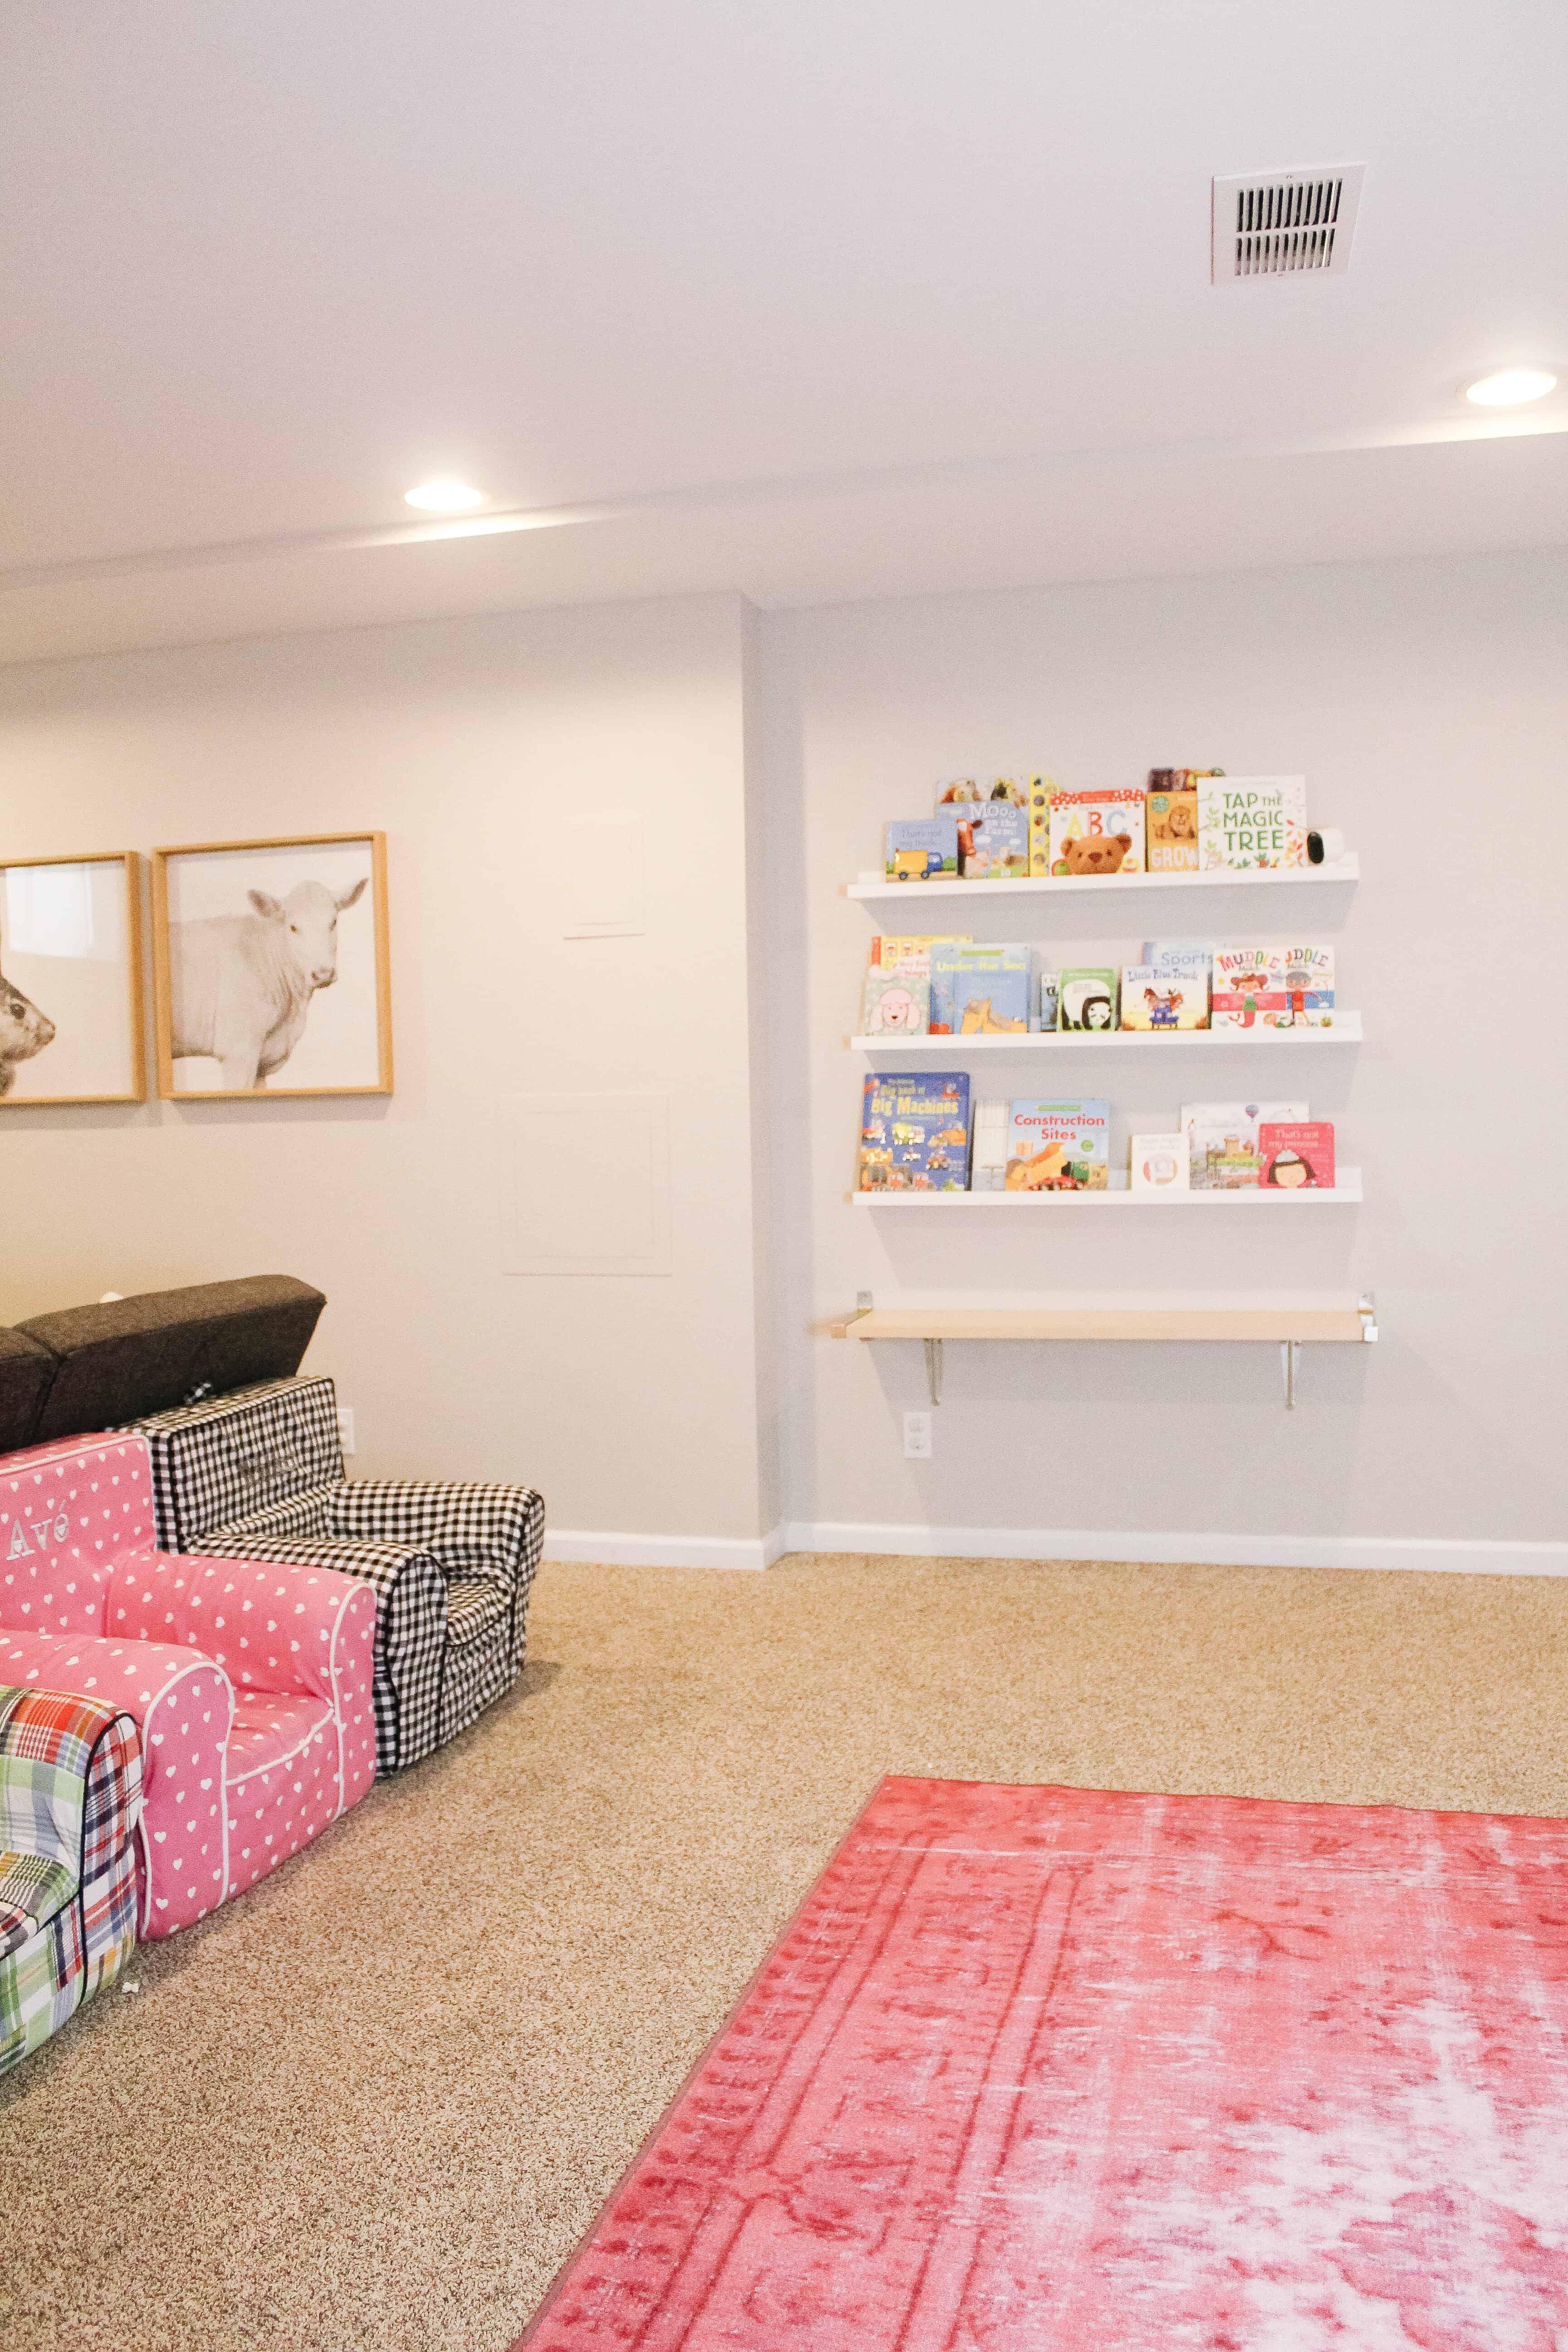 Basement playroom with Ikea bookshelves